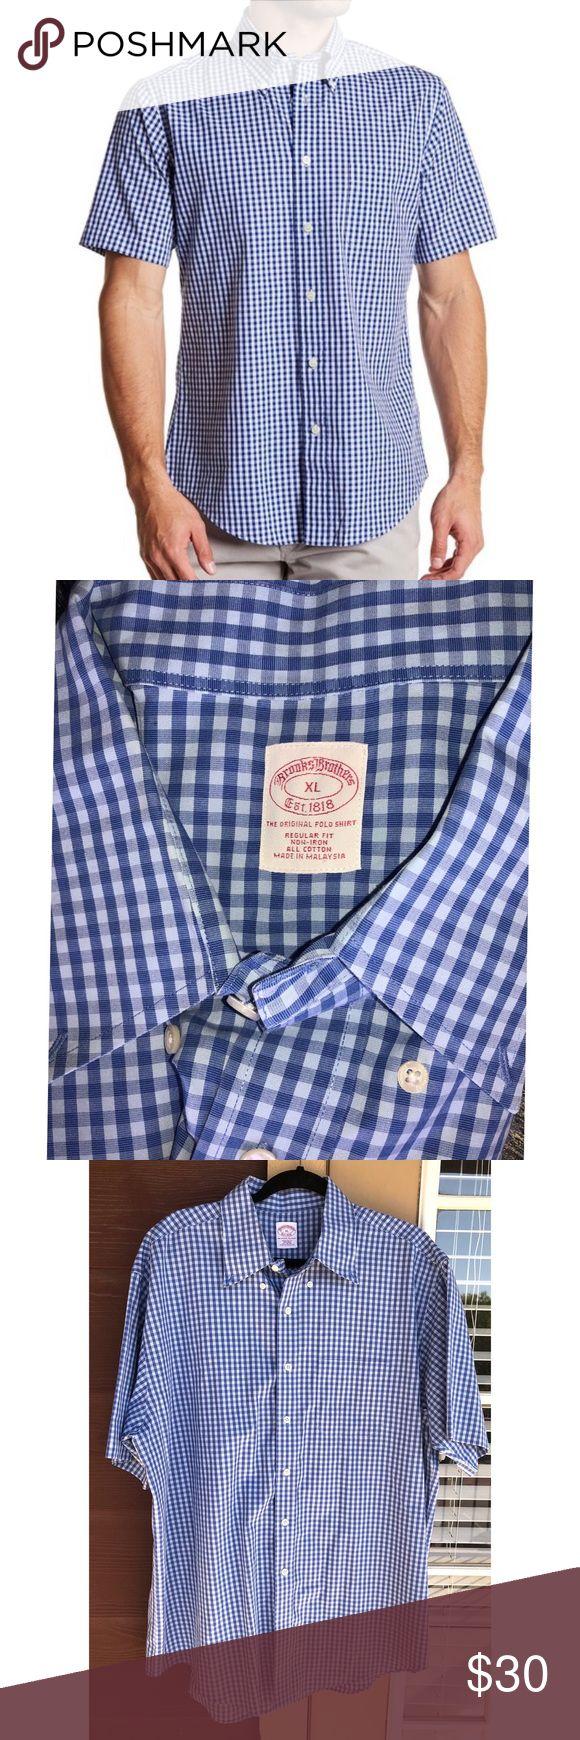 BROOKS BROTHERS Blue Checkered Gingham Shirt XL Blue